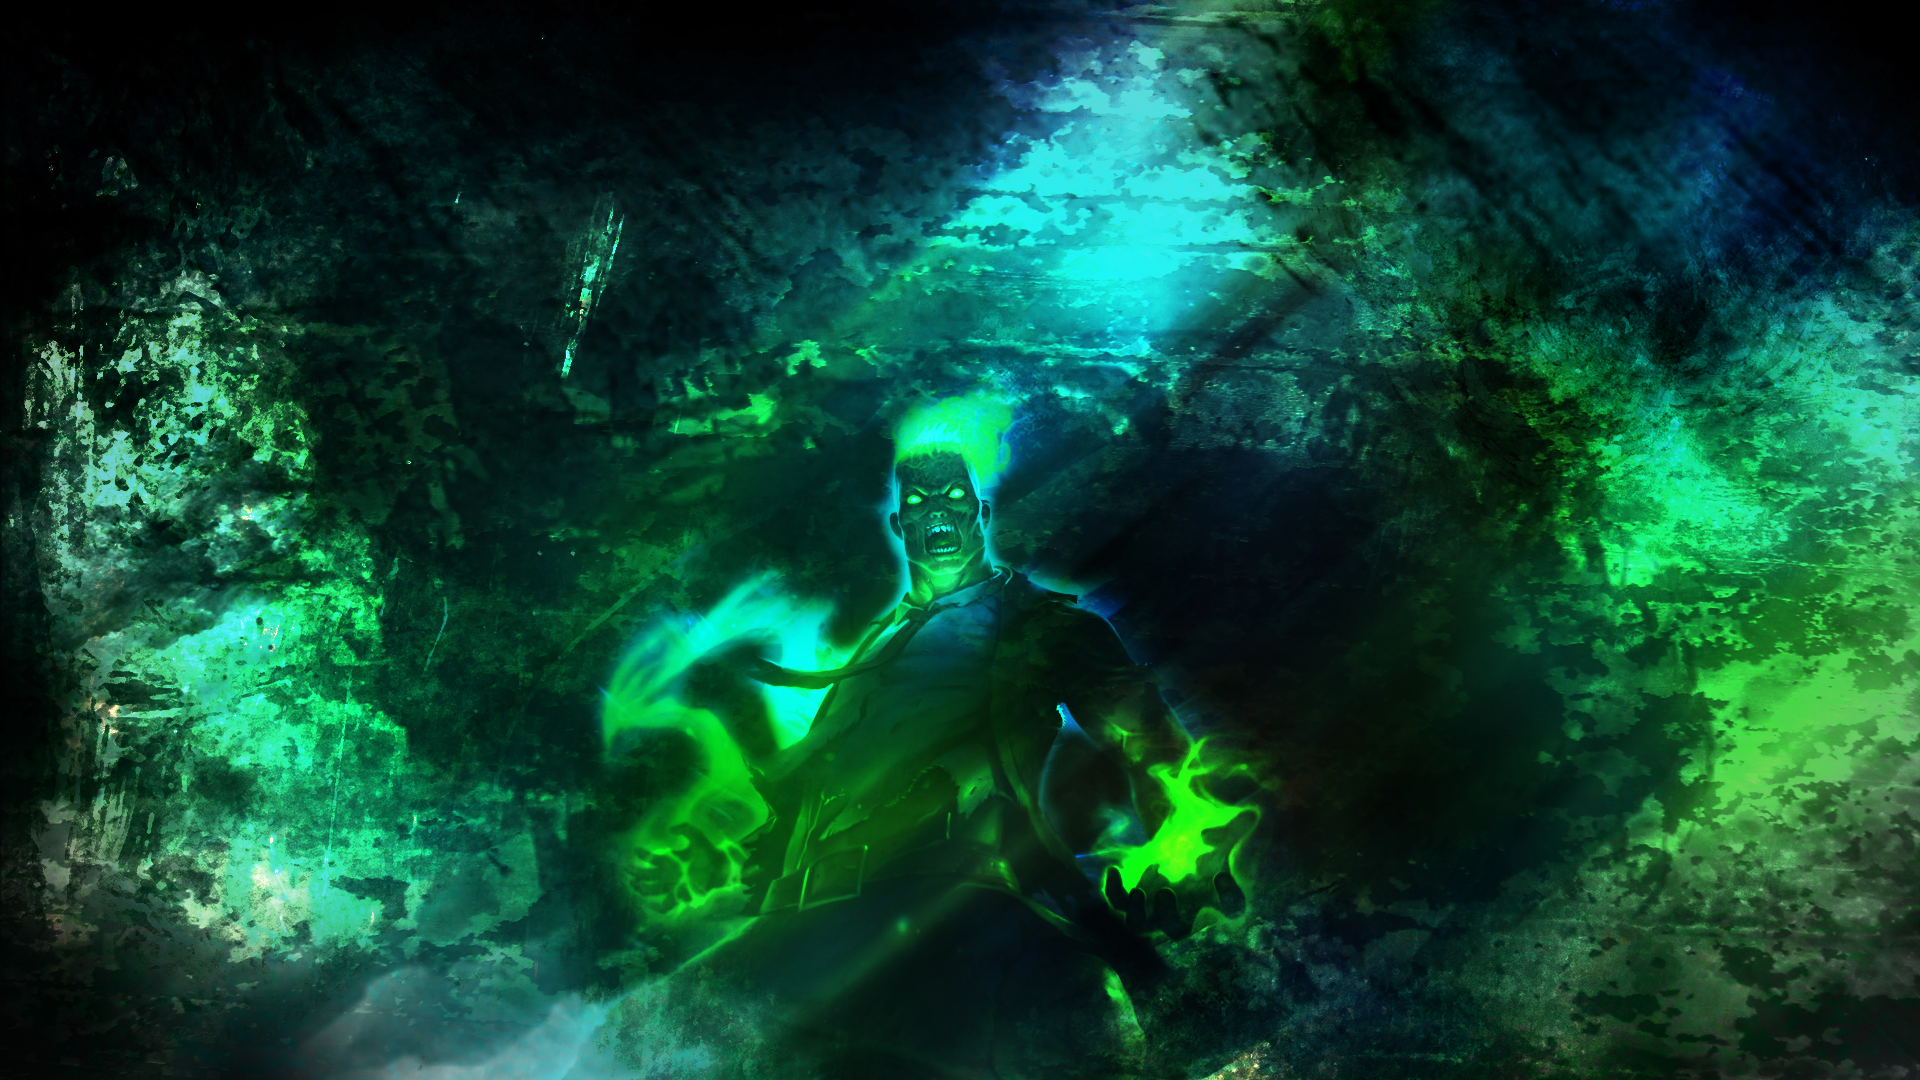 black ops 2 zombies wallpaper 1080p